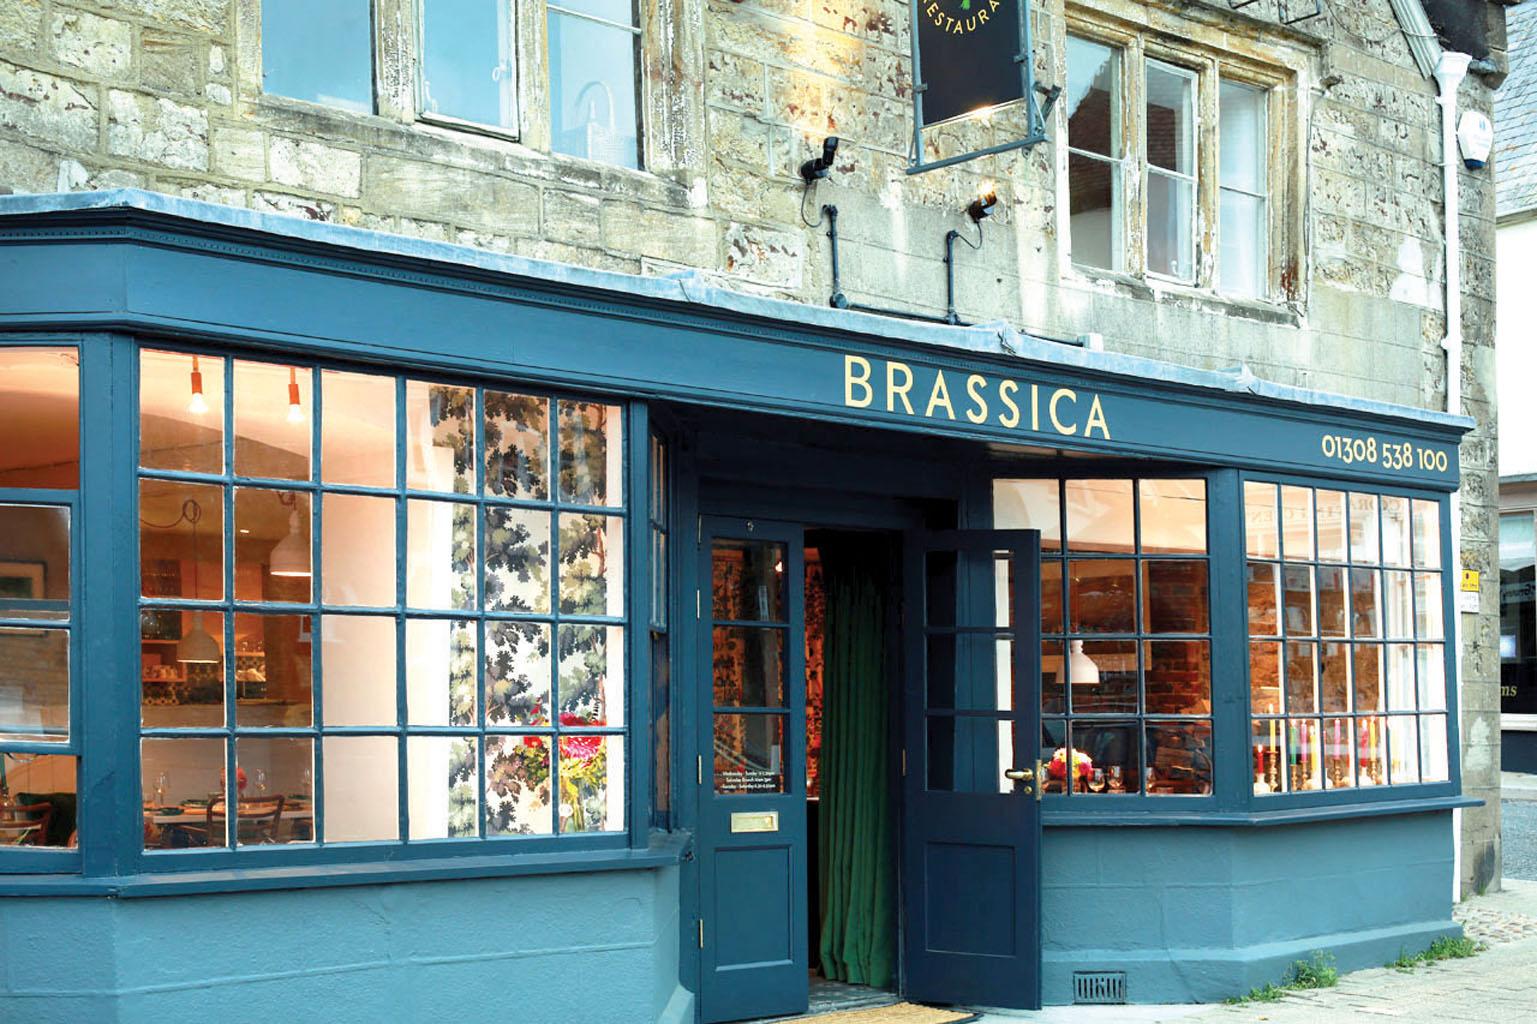 Brassica-Exterior1.jpg